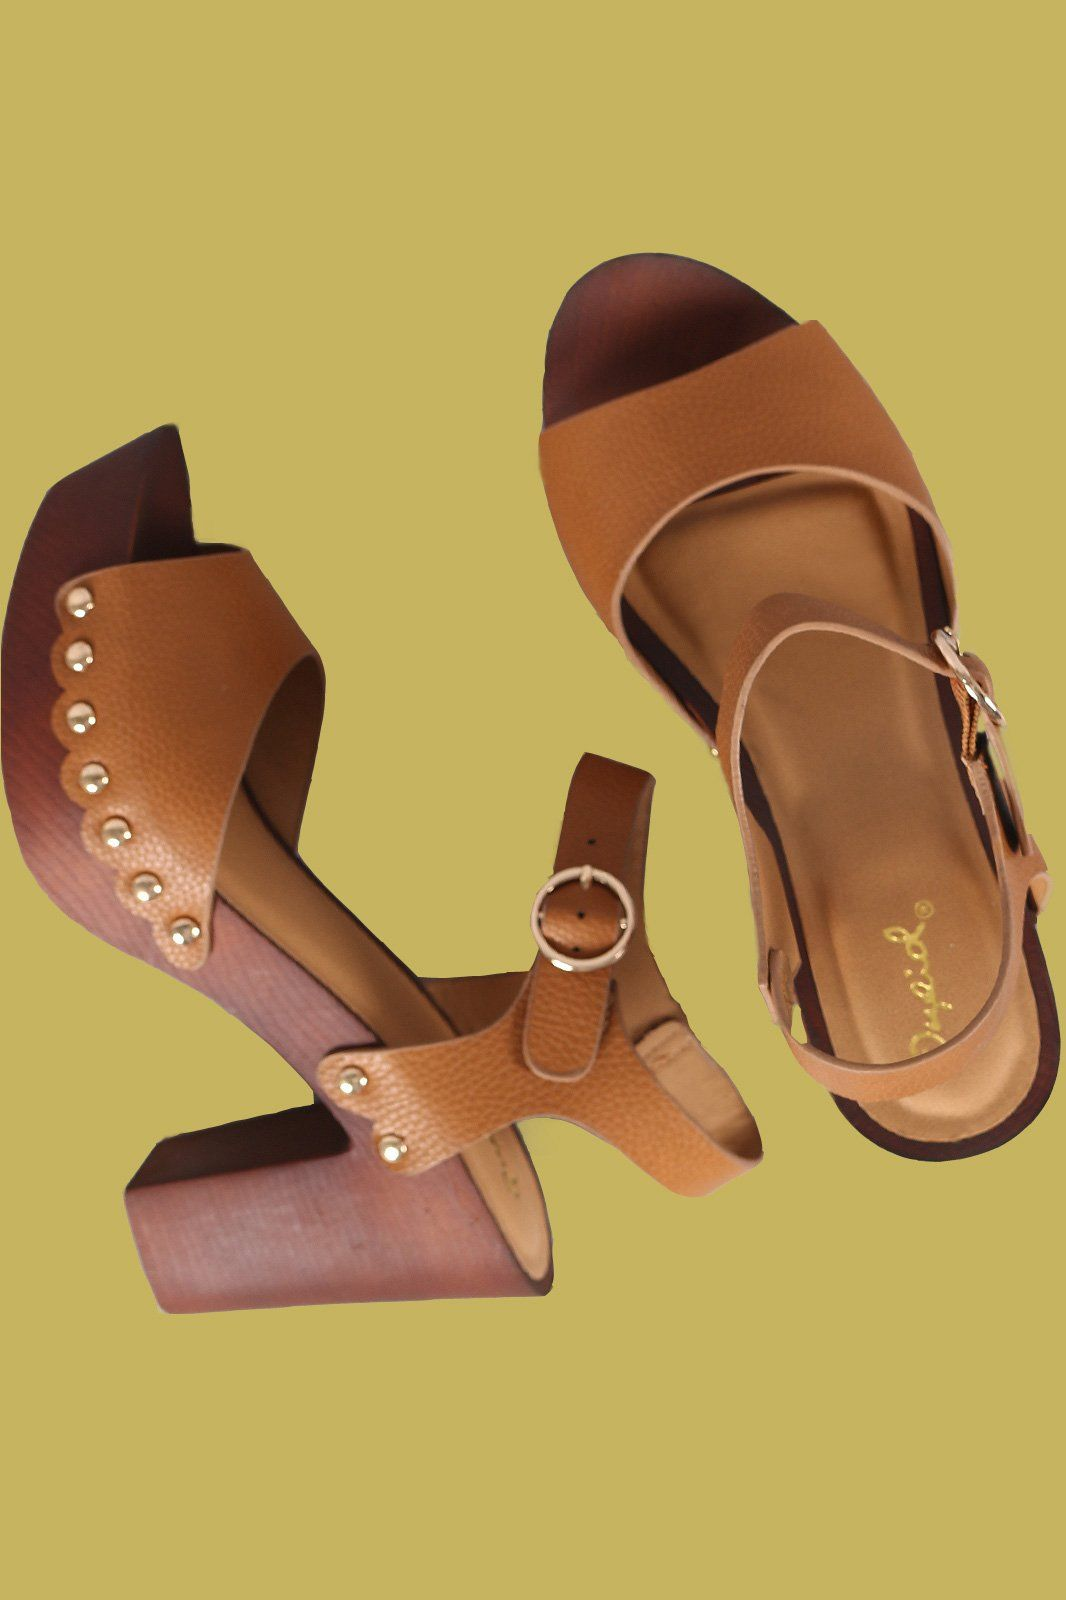 09009aa4ed3 Qupid Peep Toe Studded Faux Wooden Chunky Platform Heel